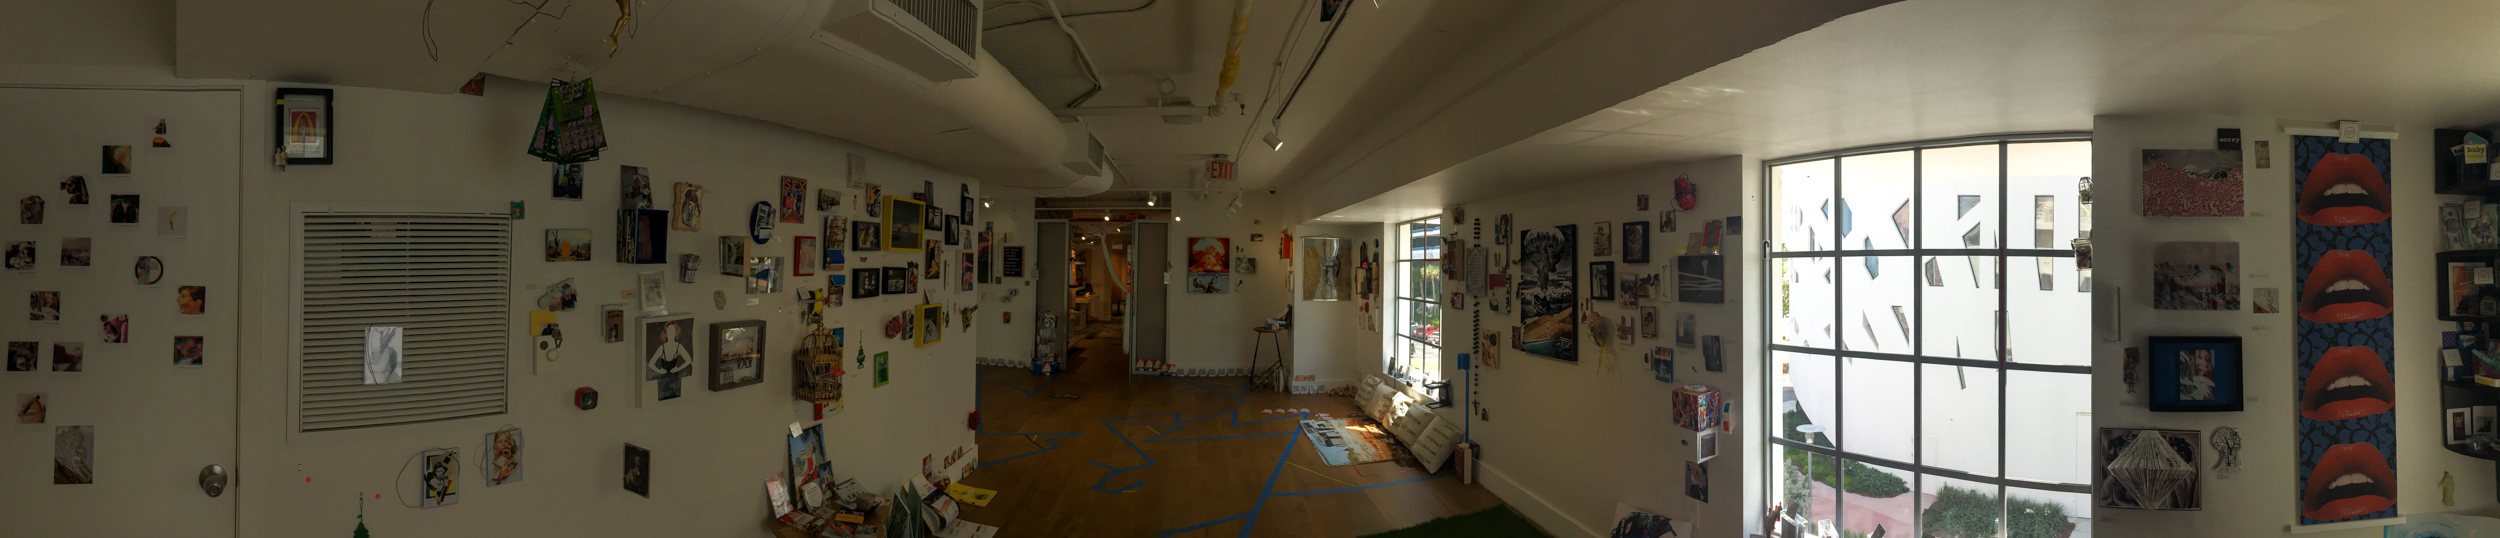 Faena-Exhibition-Images-145.jpg